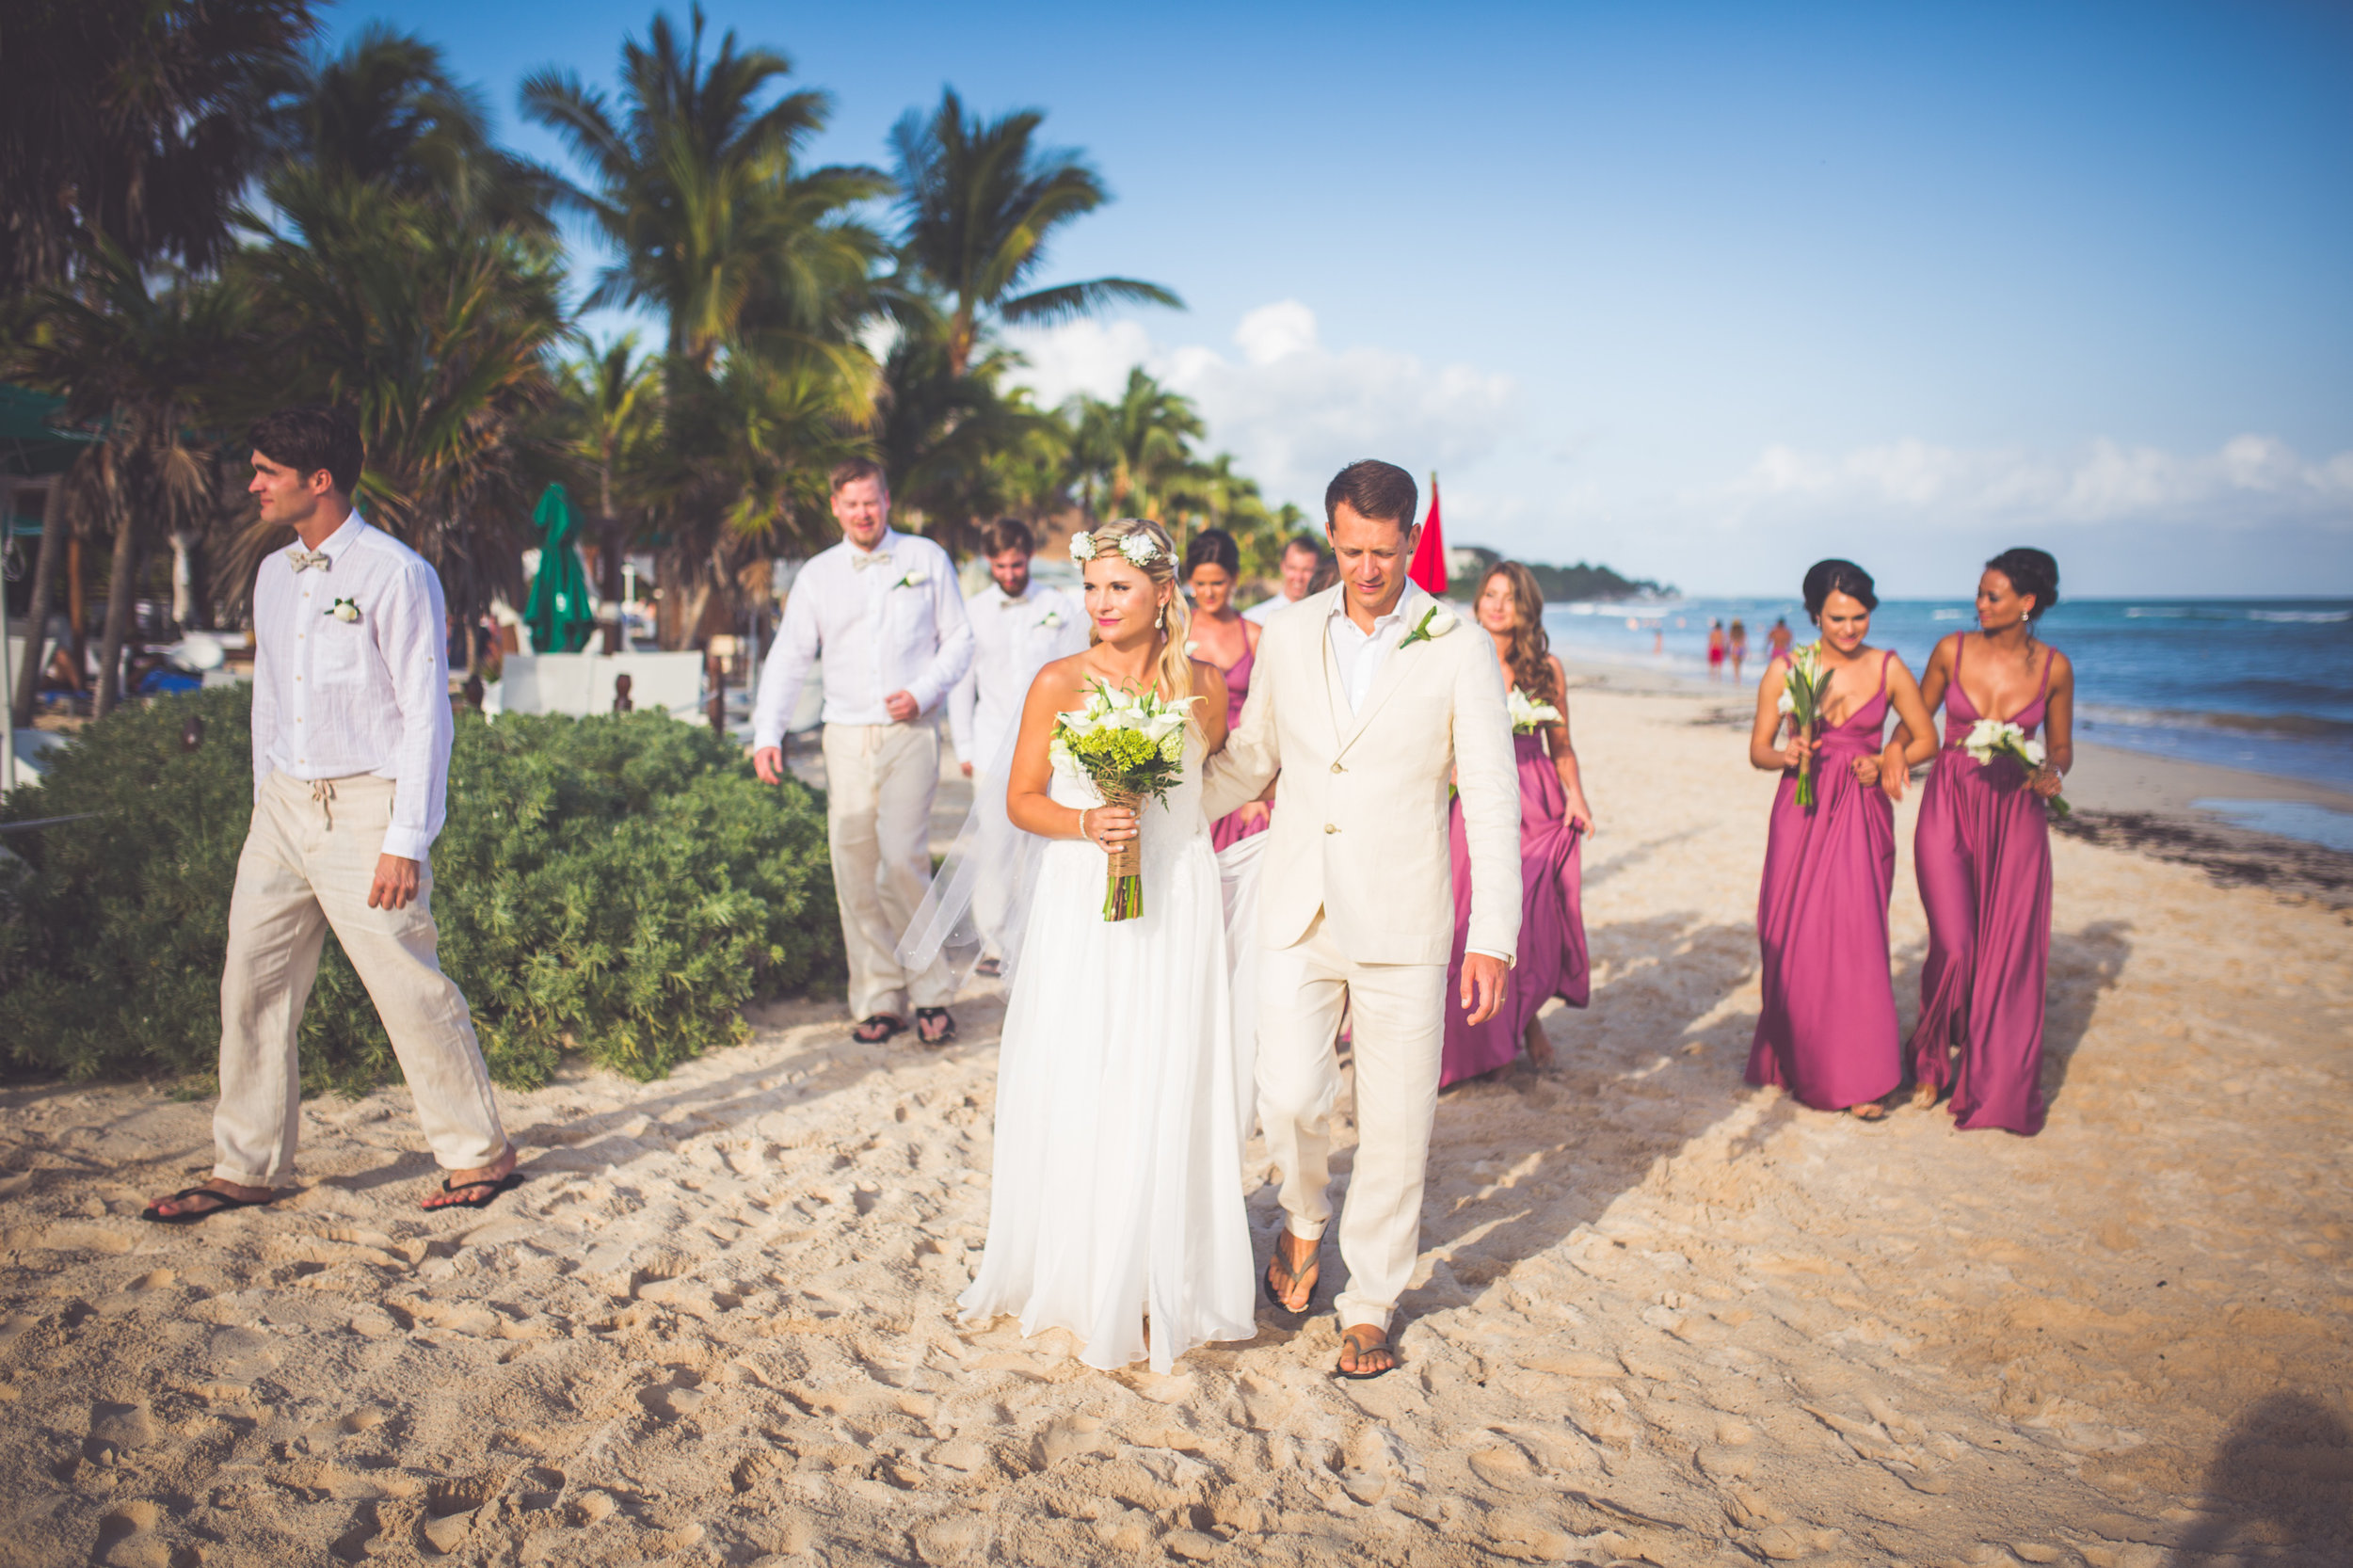 CARMEN-PETER-WEDDING-2016-126.jpg